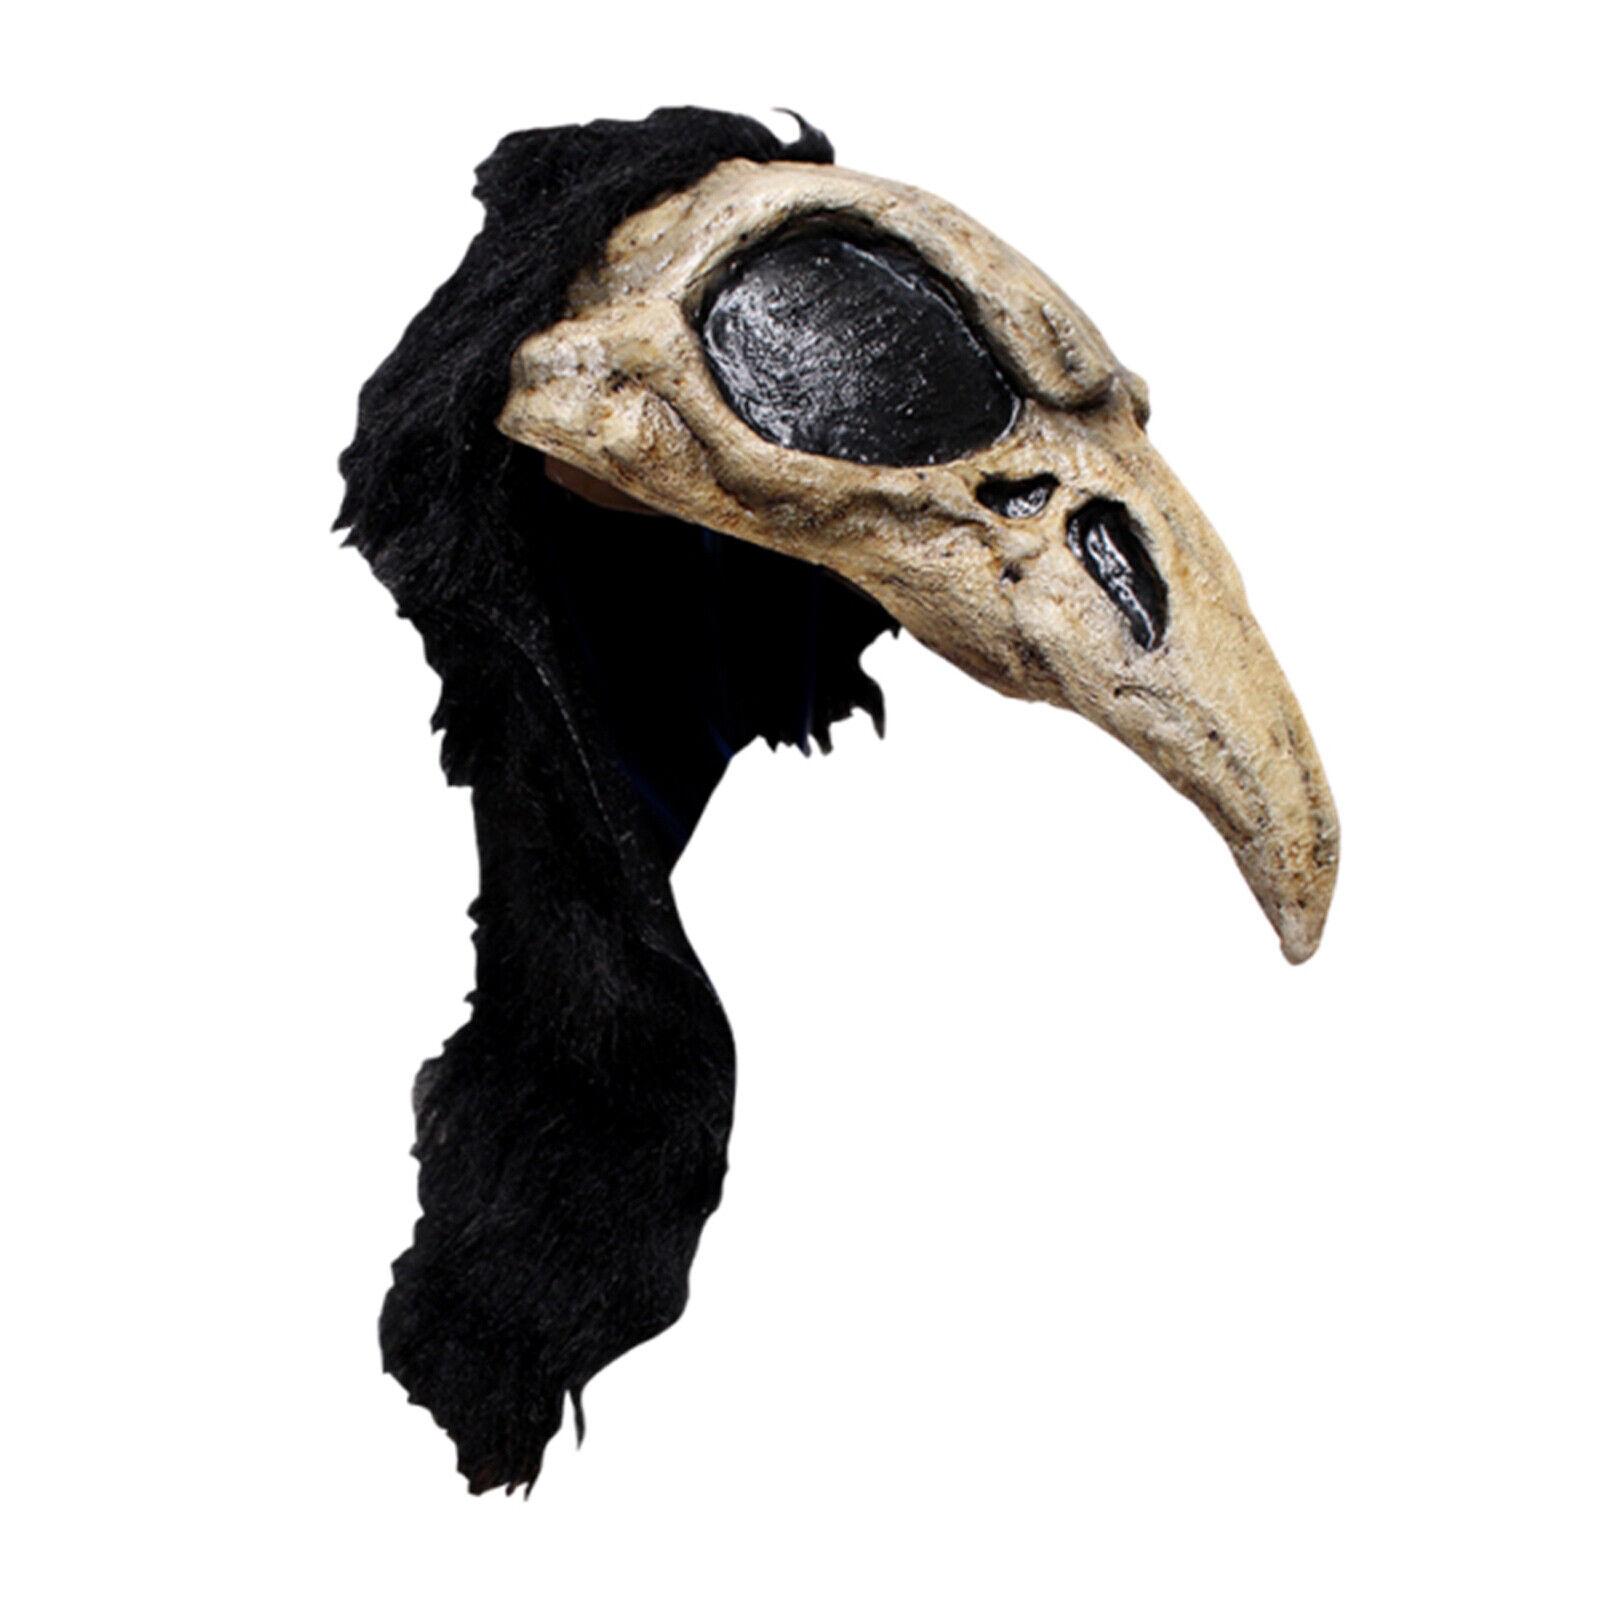 SKULL CROW BIRD HEAD HELMET MASK LATEX /& FUR  HALLOWEEN